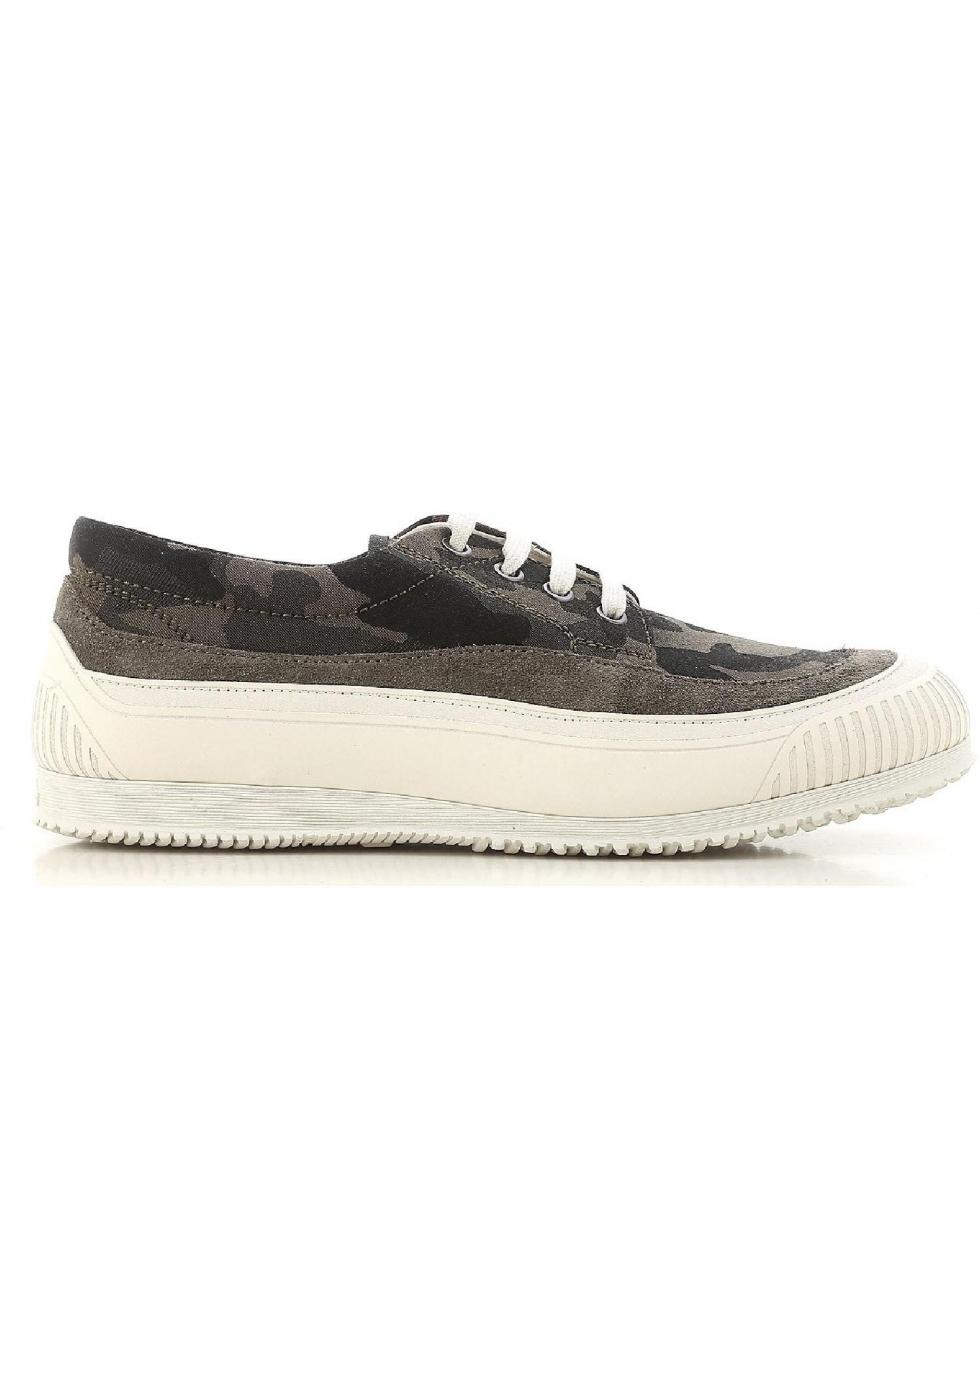 66909a43d62e5 Hogan men's low top sneakers shos in camouflage fabric - Italian ...